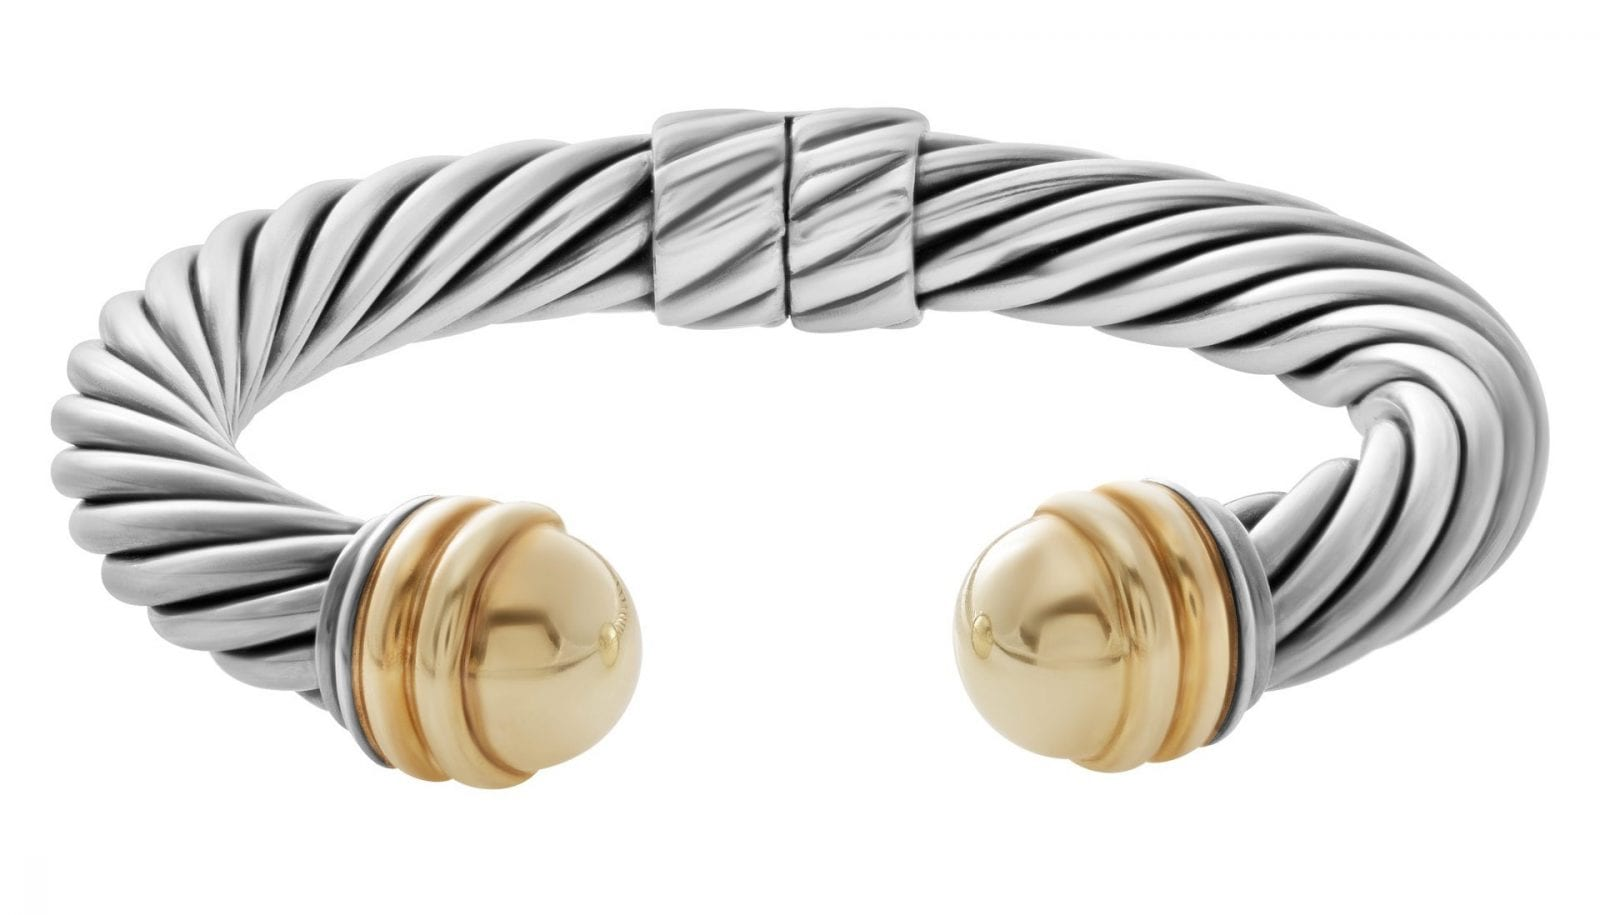 David Yurman Cable Braclet Silver Gold 1 - David Yurman - Sculptând atemporalitatea